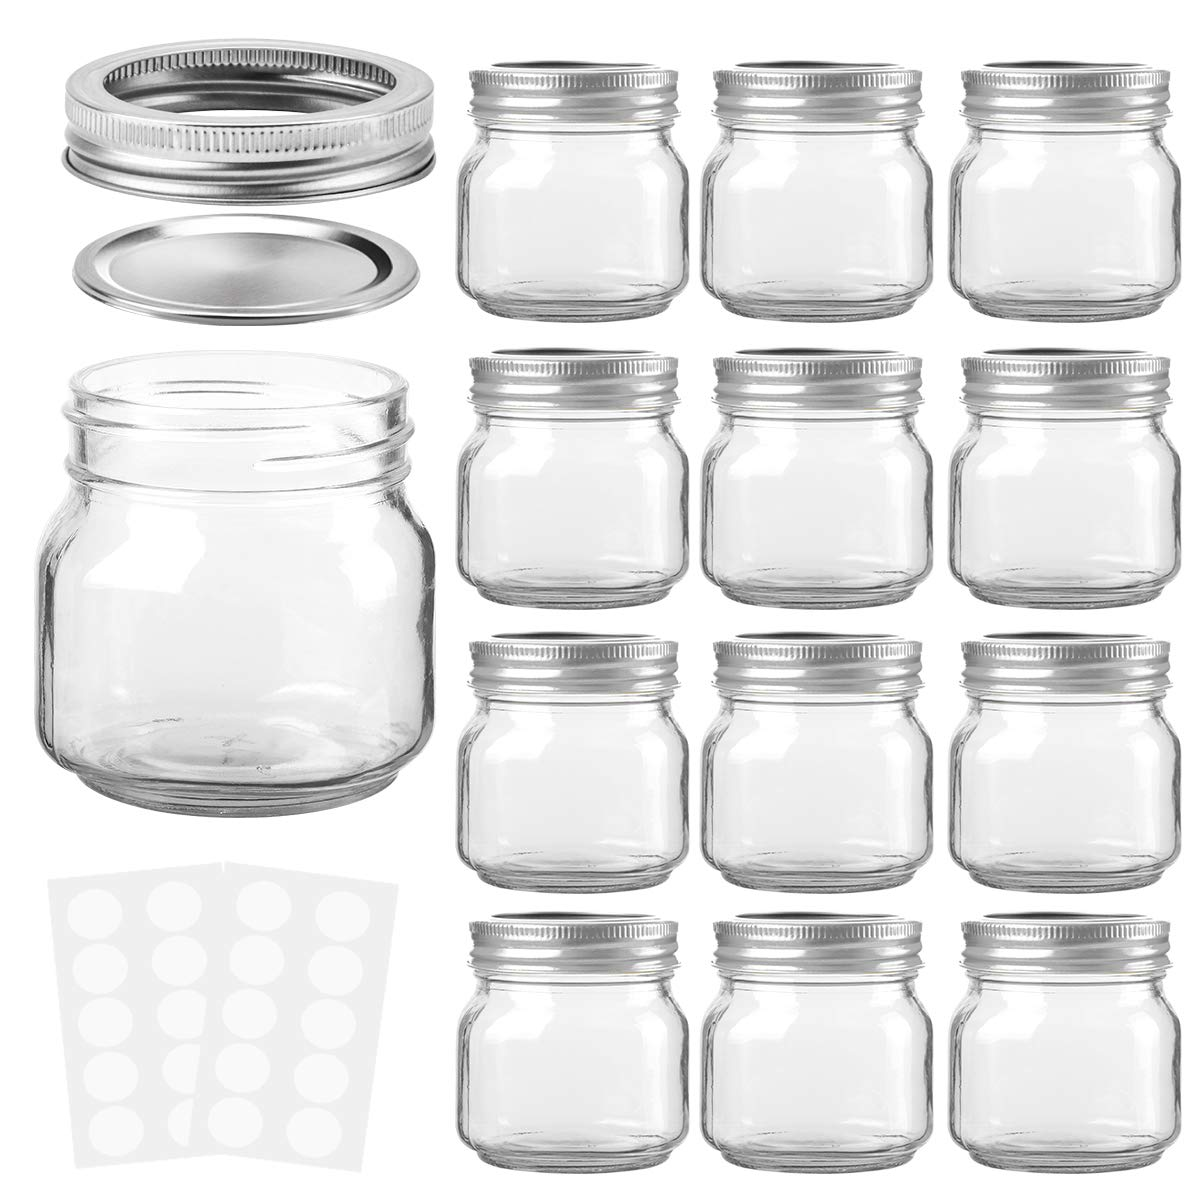 KAMOTA Mason Jars 8OZ With Regular Lids and Bands, Ideal for Jam, Honey, Wedding Favors, Shower Favors, Baby Foods, DIY Magnetic Spice Jars, 12 PACK, 20 Whiteboard Labels Included